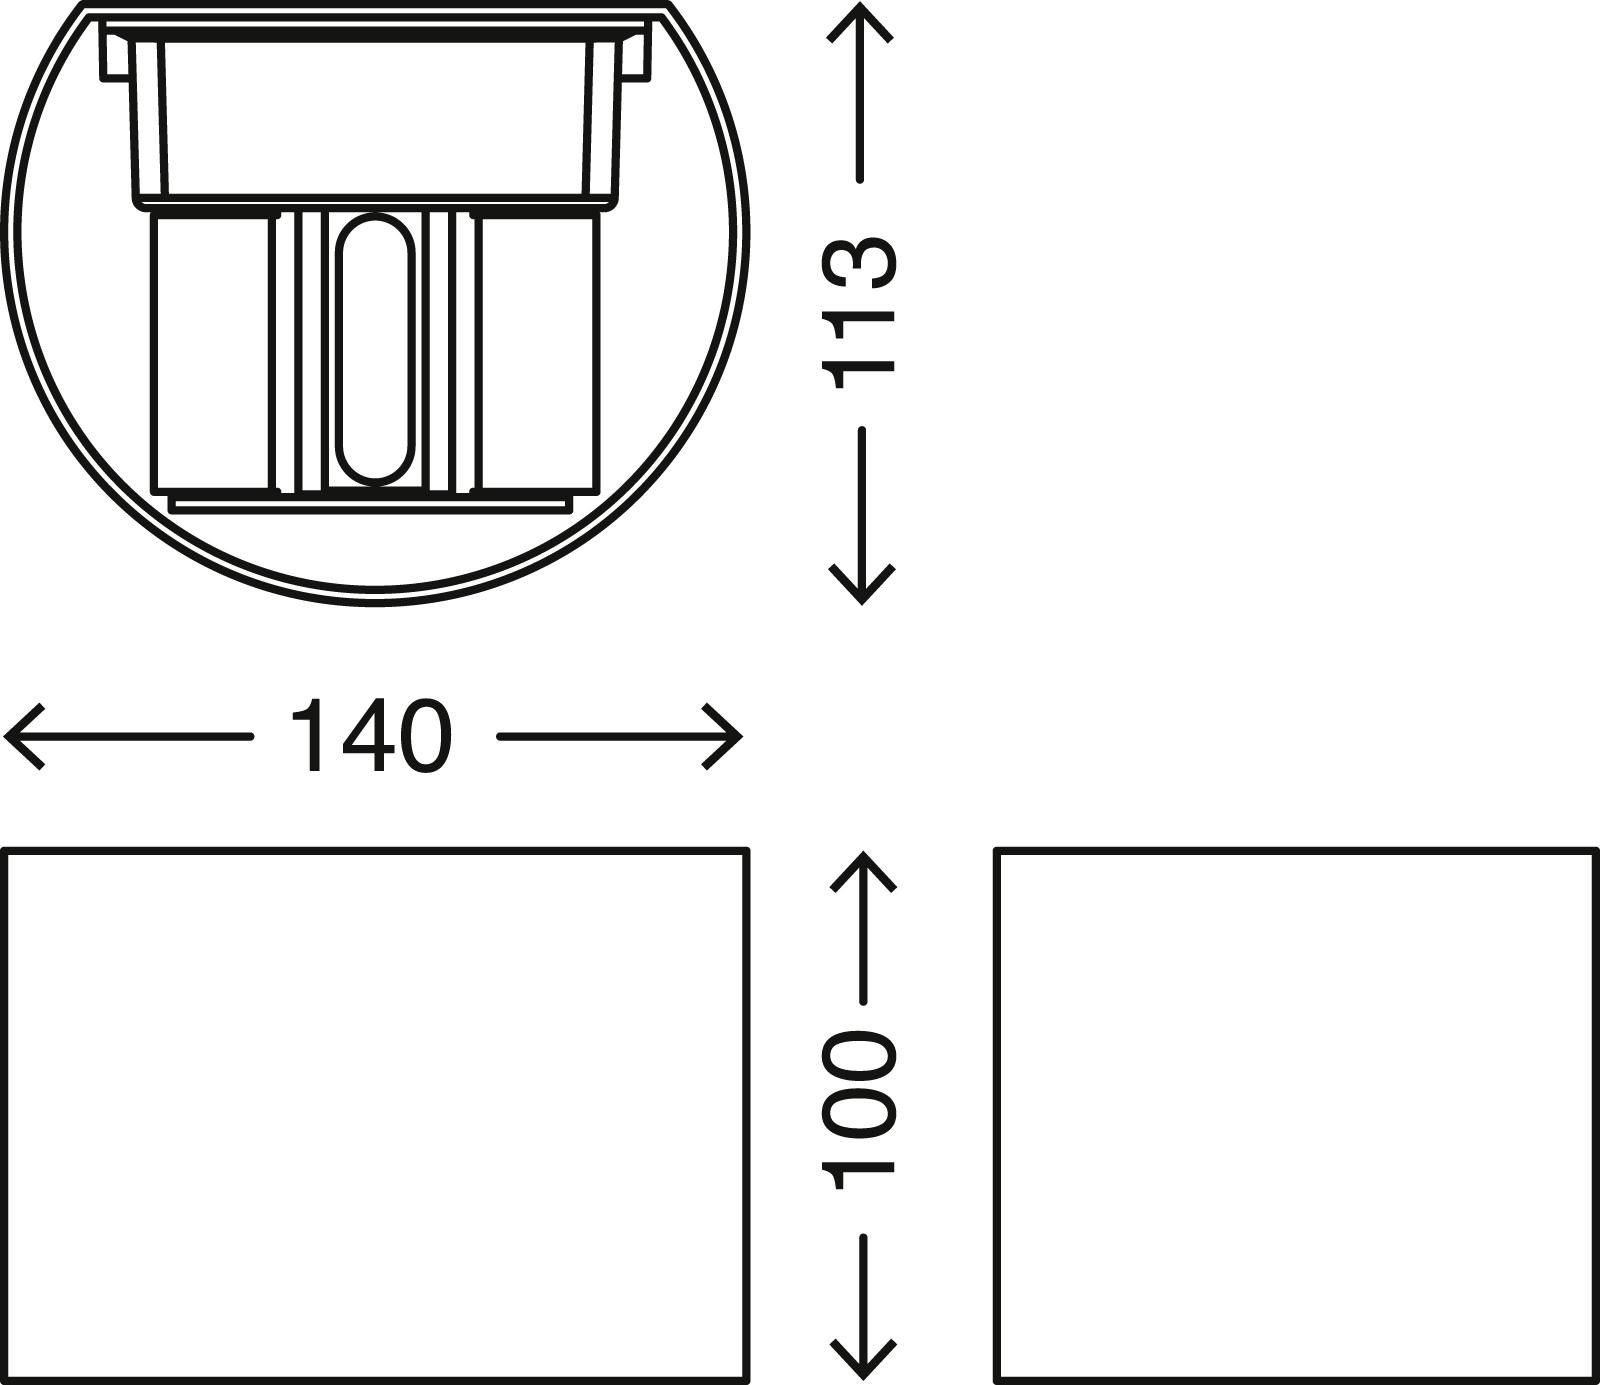 TELEFUNKEN LED Aussenleuchte, 14 cm, 7 W, Weiss